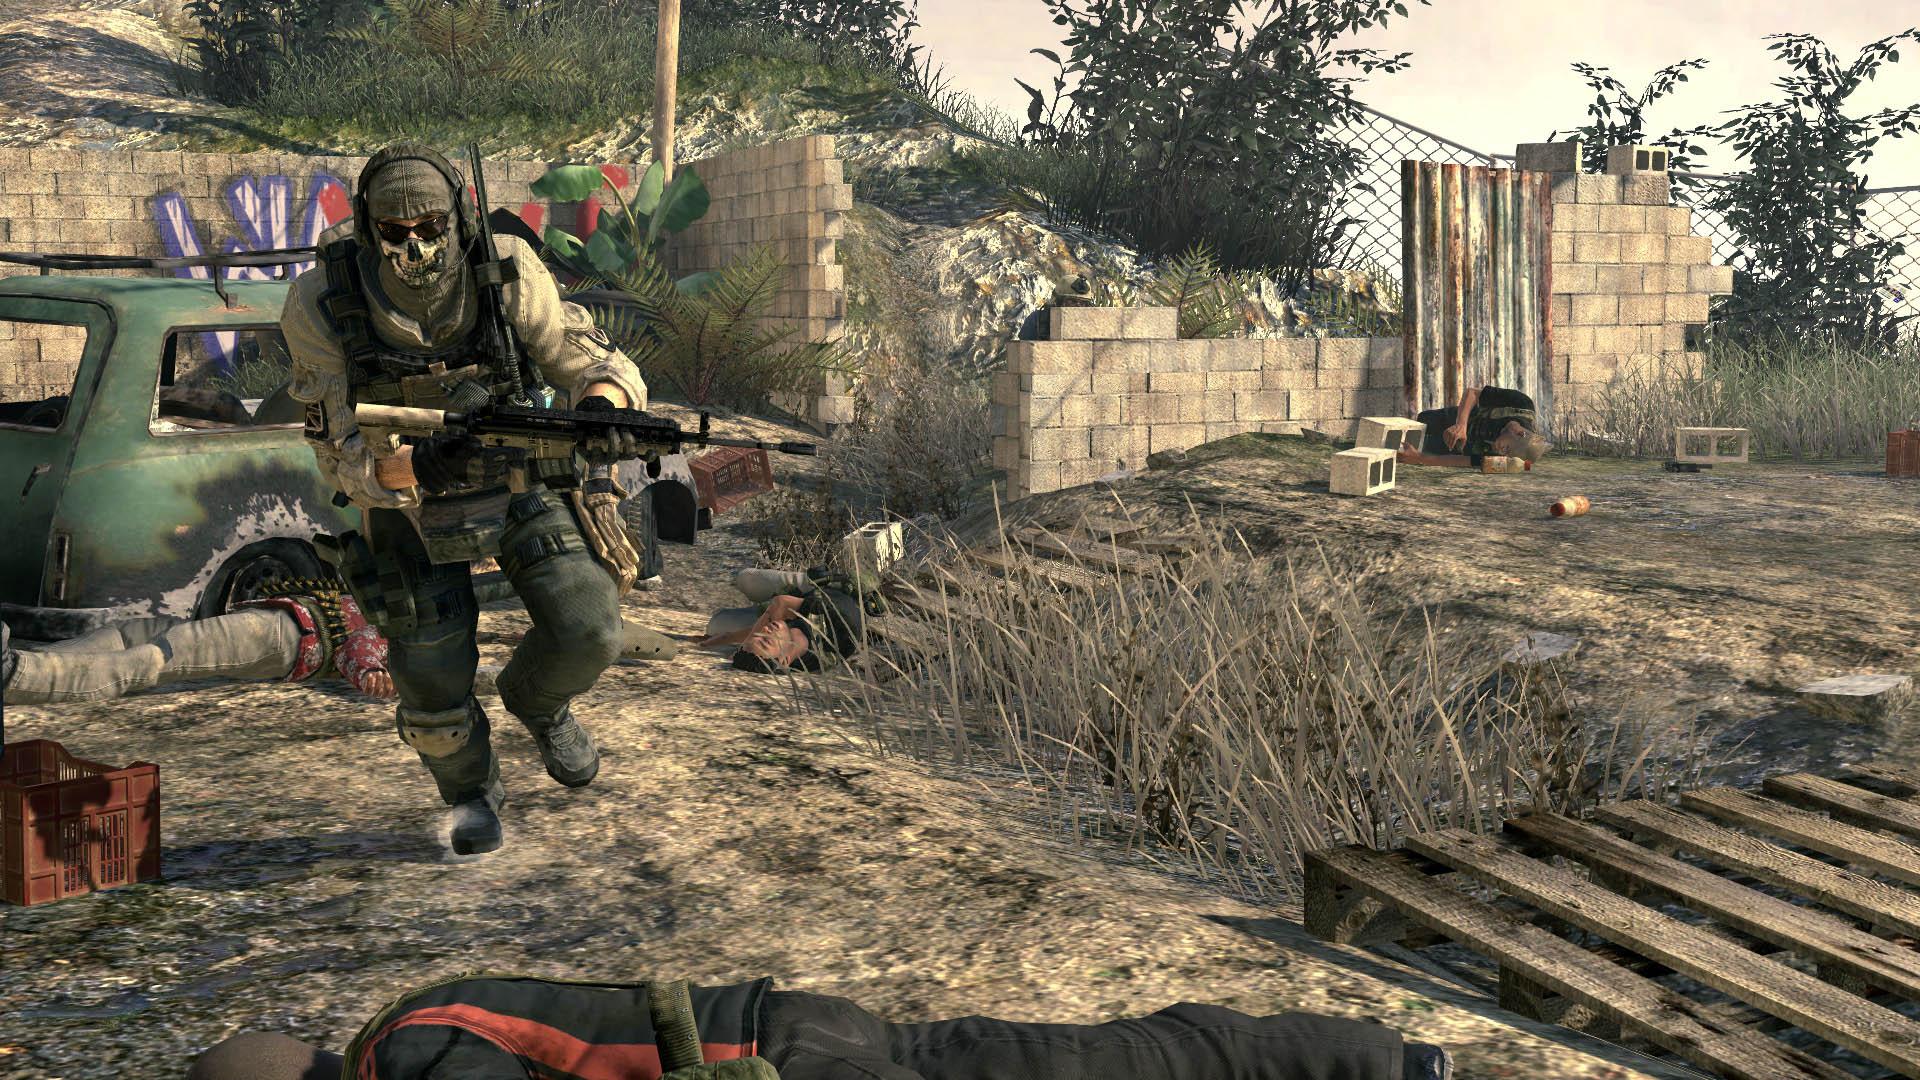 Call of duty modern warfare 2 gun - Image Call Of Duty Modern Warfare 2 Wallpapers Ghost Jpg Call Of Duty Wiki Fandom Powered By Wikia